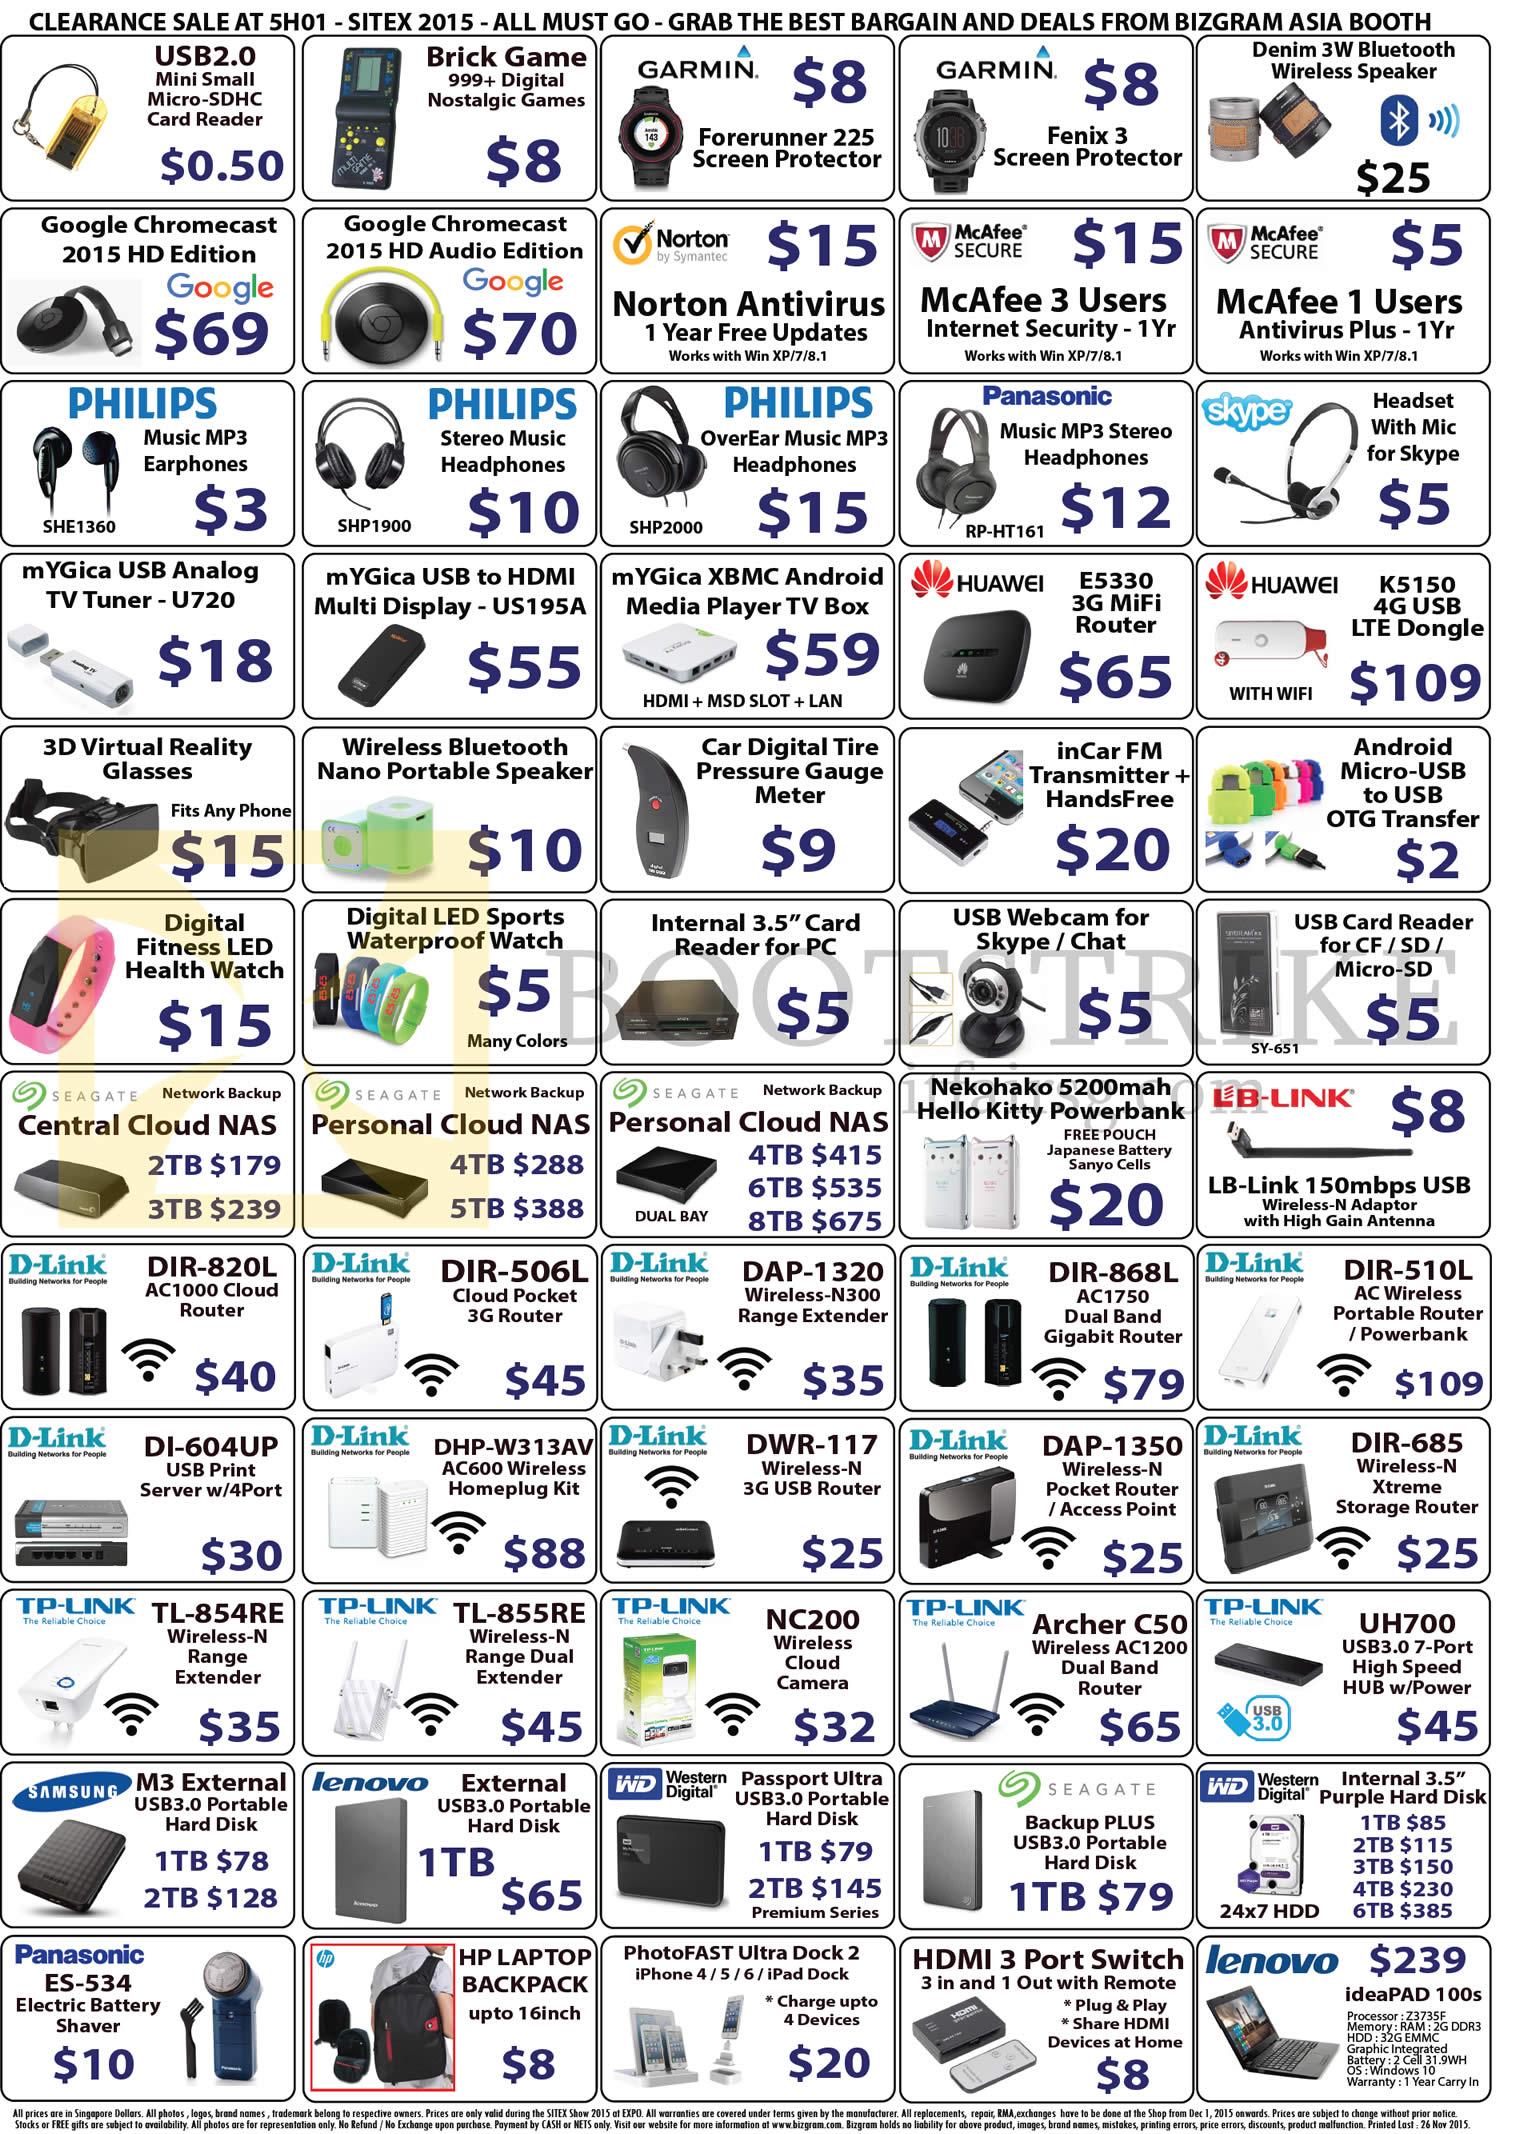 SITEX 2015 price list image brochure of Bizgram Accessories Card Reader, Brick Game, Wireless Speaker, Antivirus, Earphones, Headphones, Router, Dongle, Webcam, Fitness Health Watch, Router, Personal Cloud NAS, Powerbank